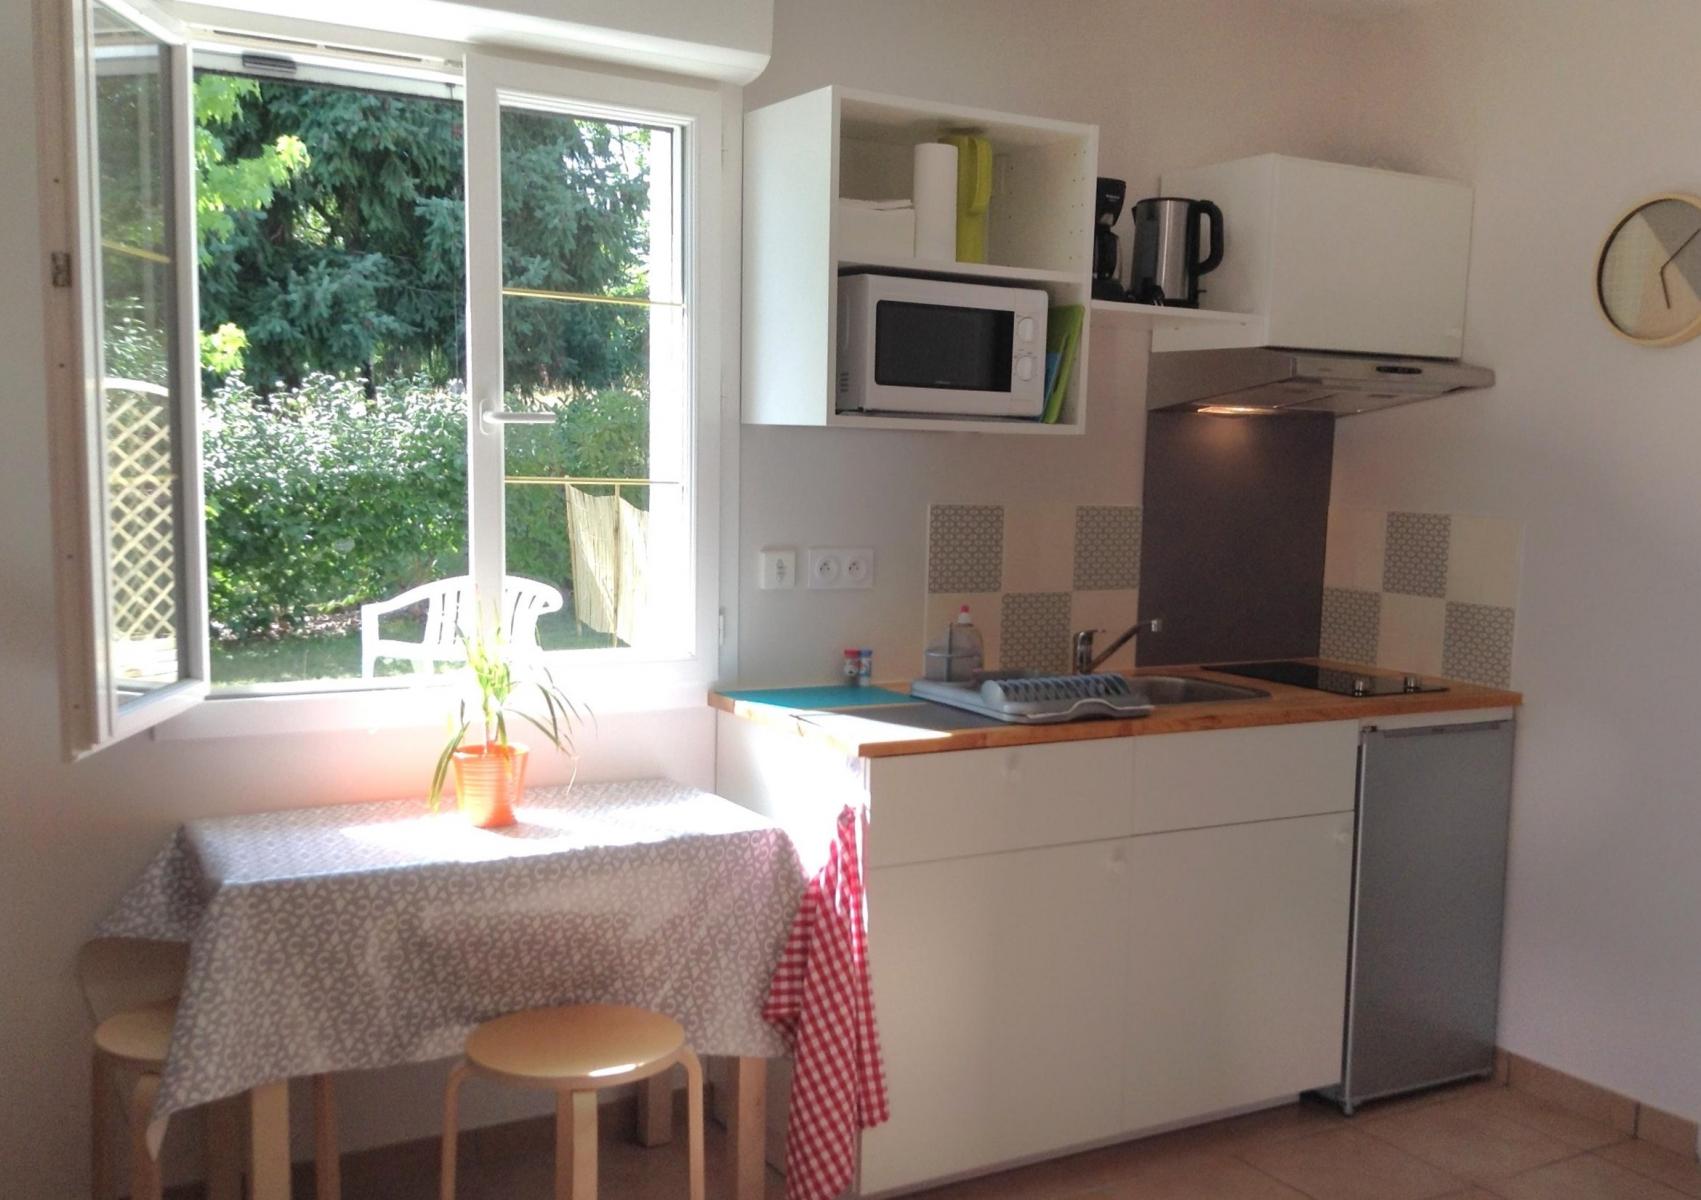 BB-Le-Roi-Coq-duplex-cuisine